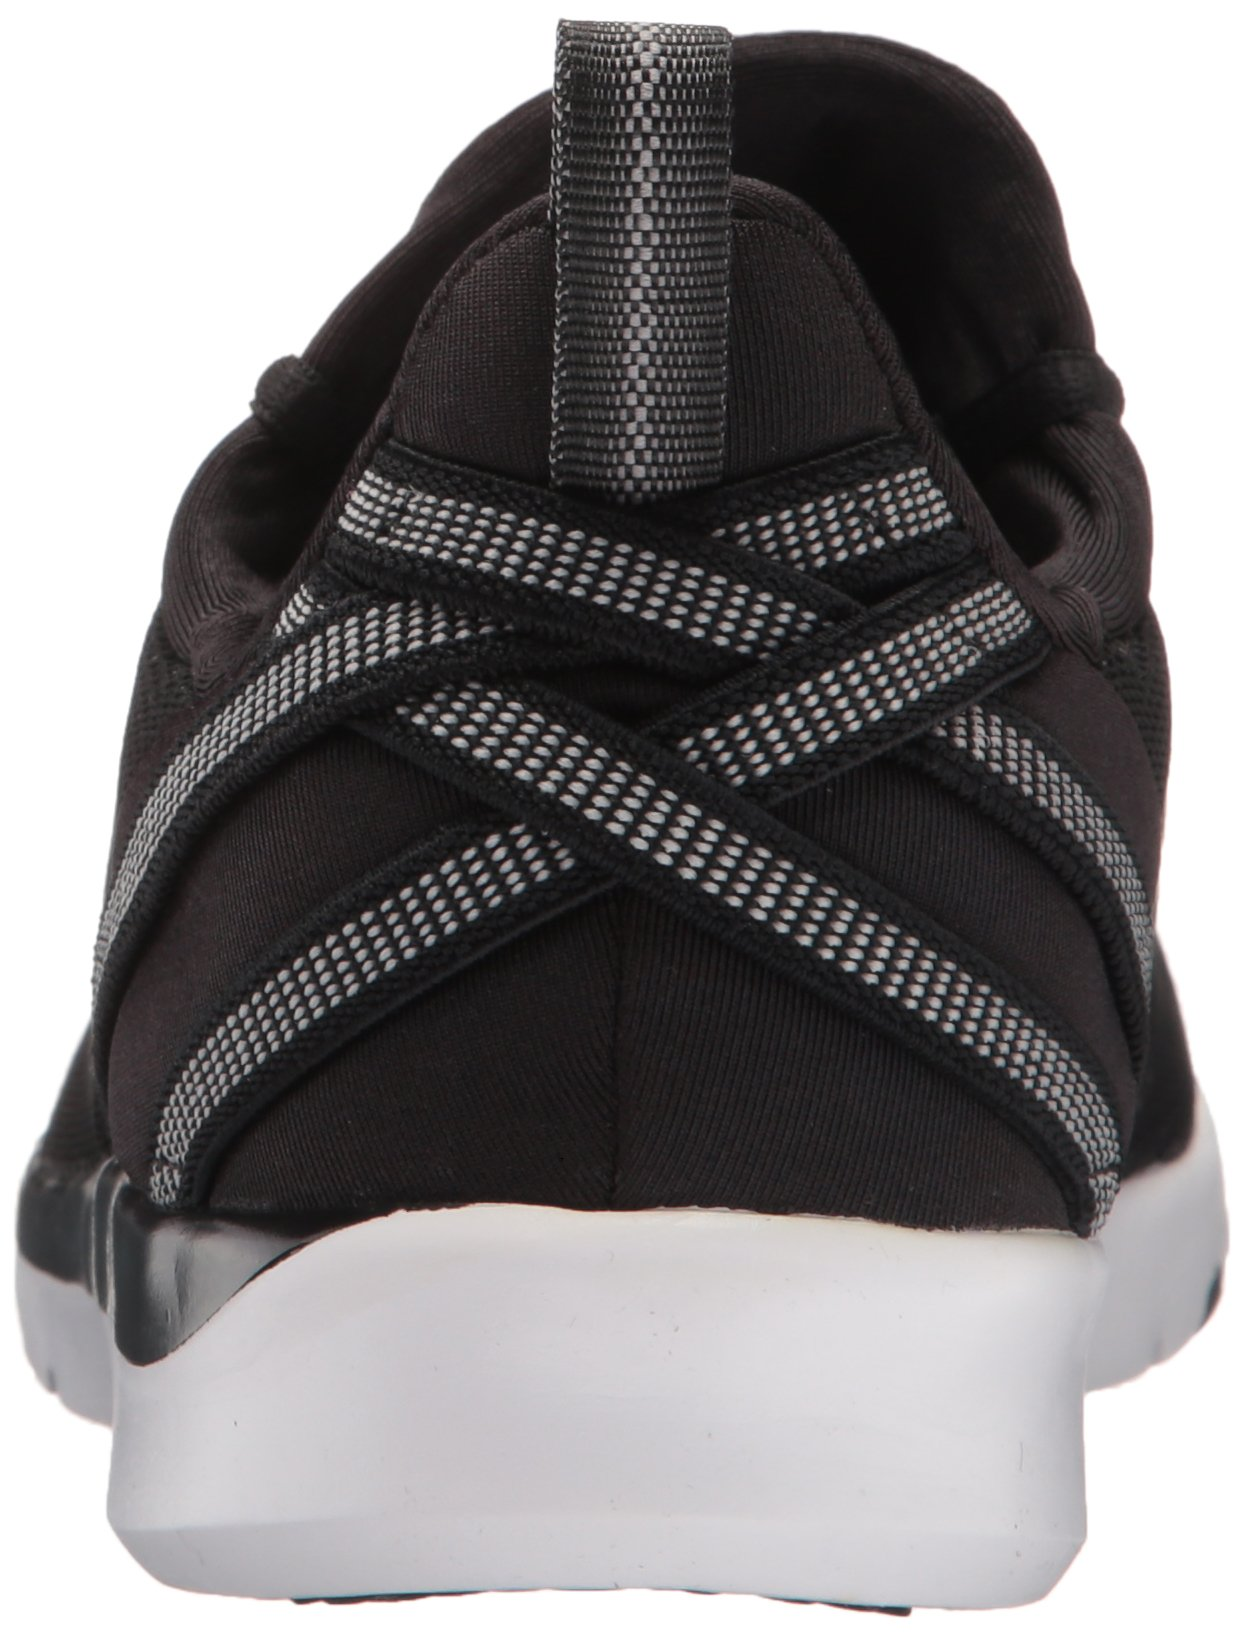 ASICS Women's Gel-Fit Sana 3 Cross-Trainer Shoe, Black/White/Silver, 8.5 M US by ASICS (Image #2)